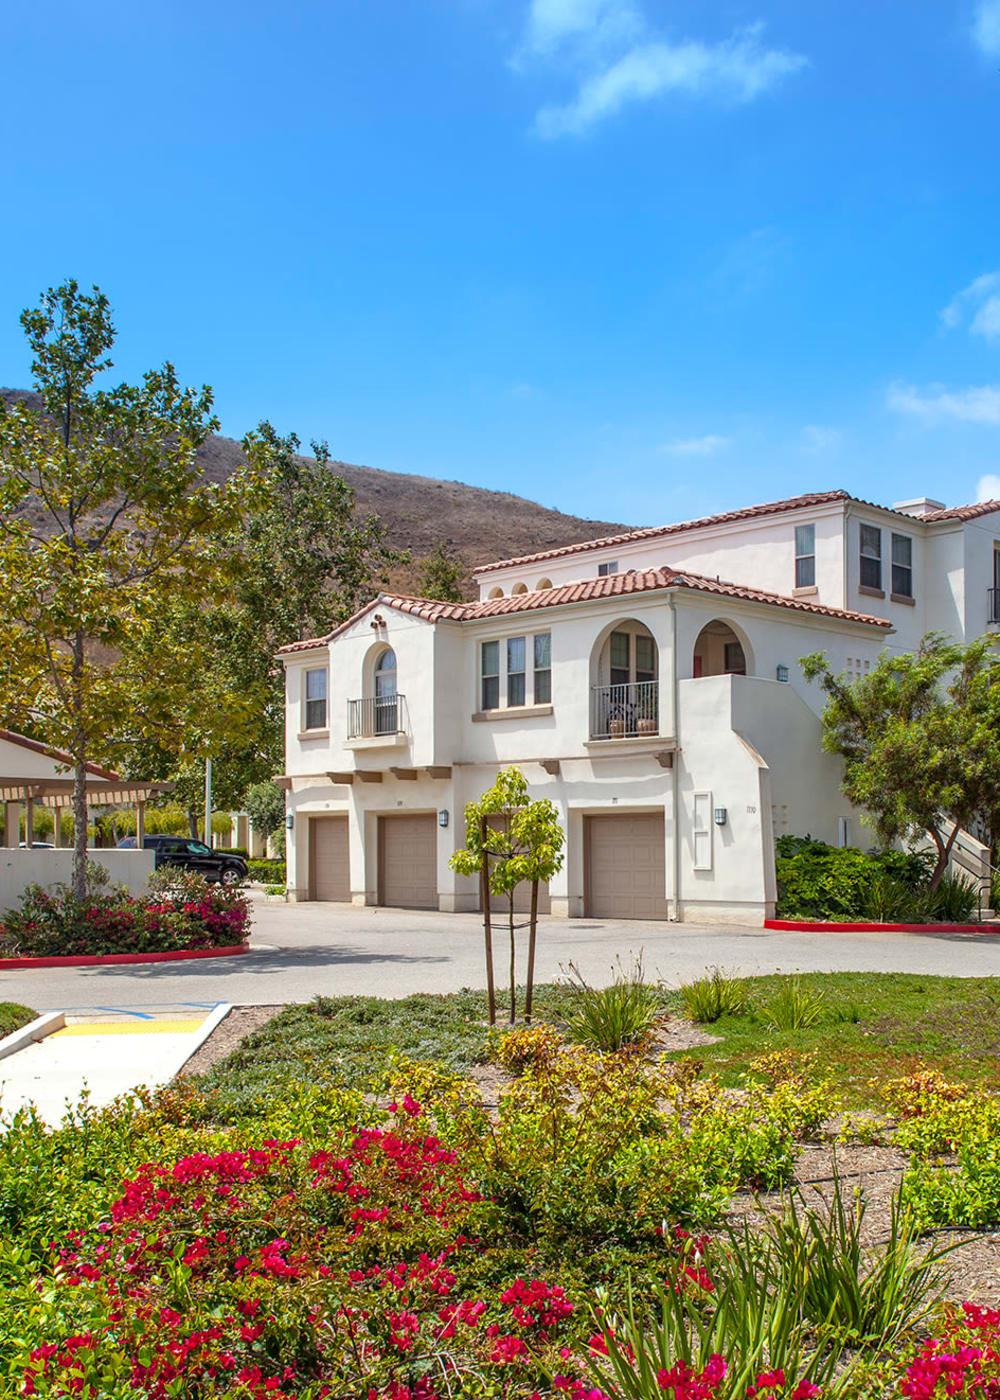 Luxury apartments at Mission Hills in Camarillo, California